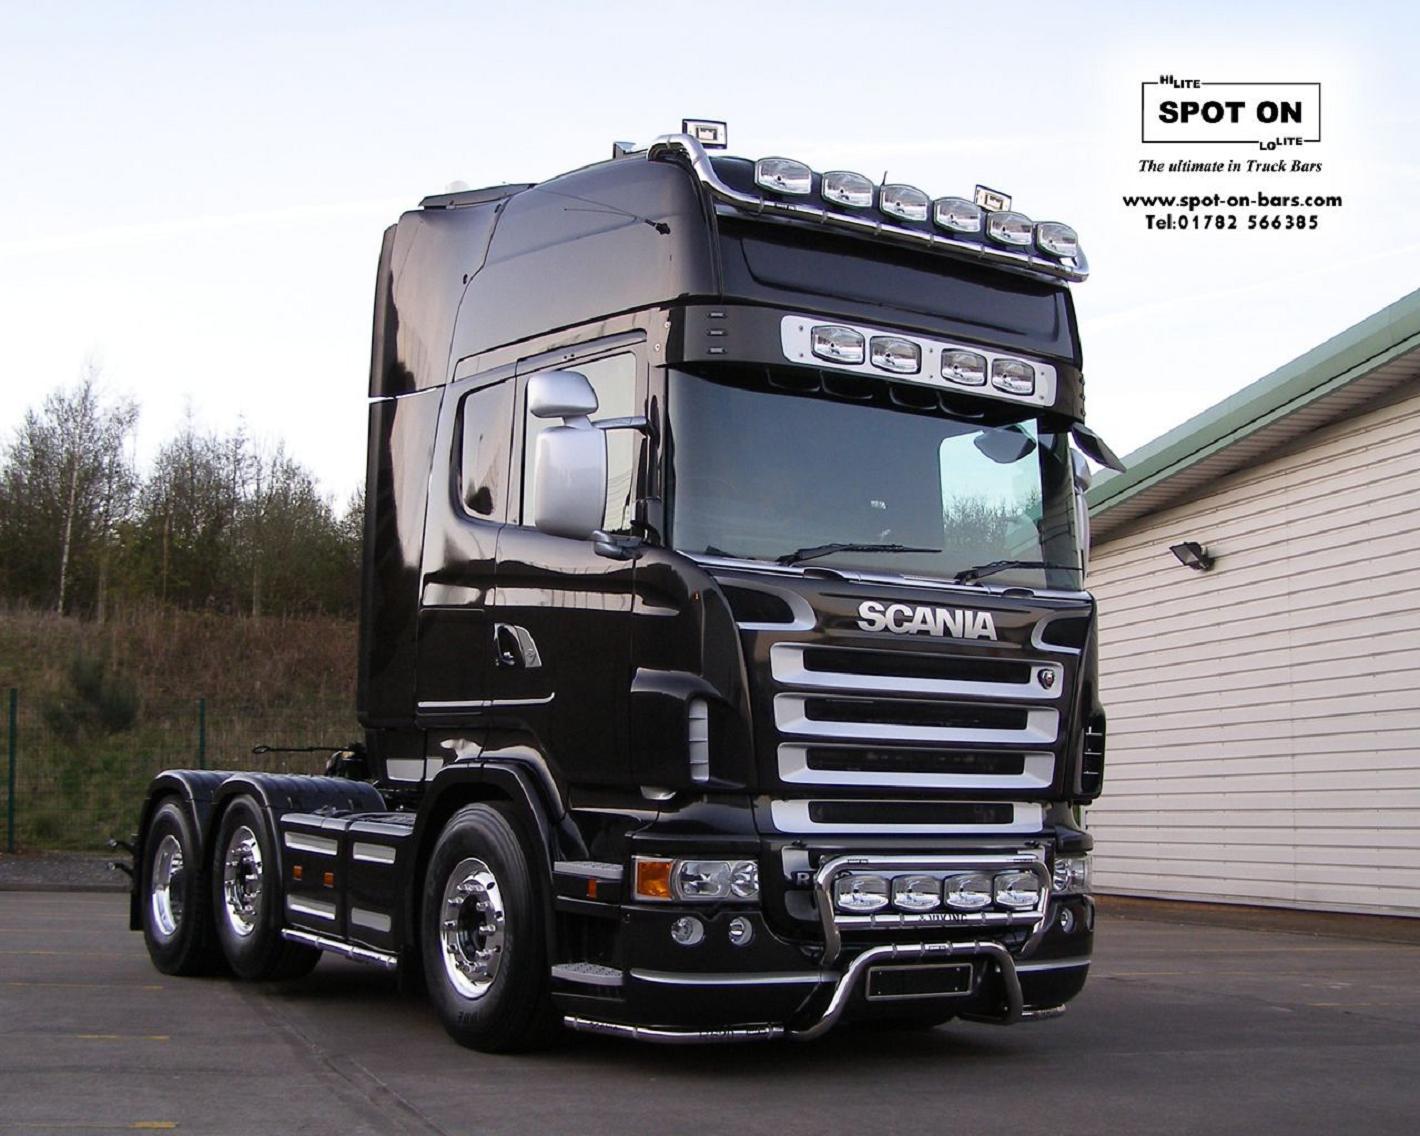 trucks wallpapers scania truck wallpaper scania truck wallpaper scania 1420x1136